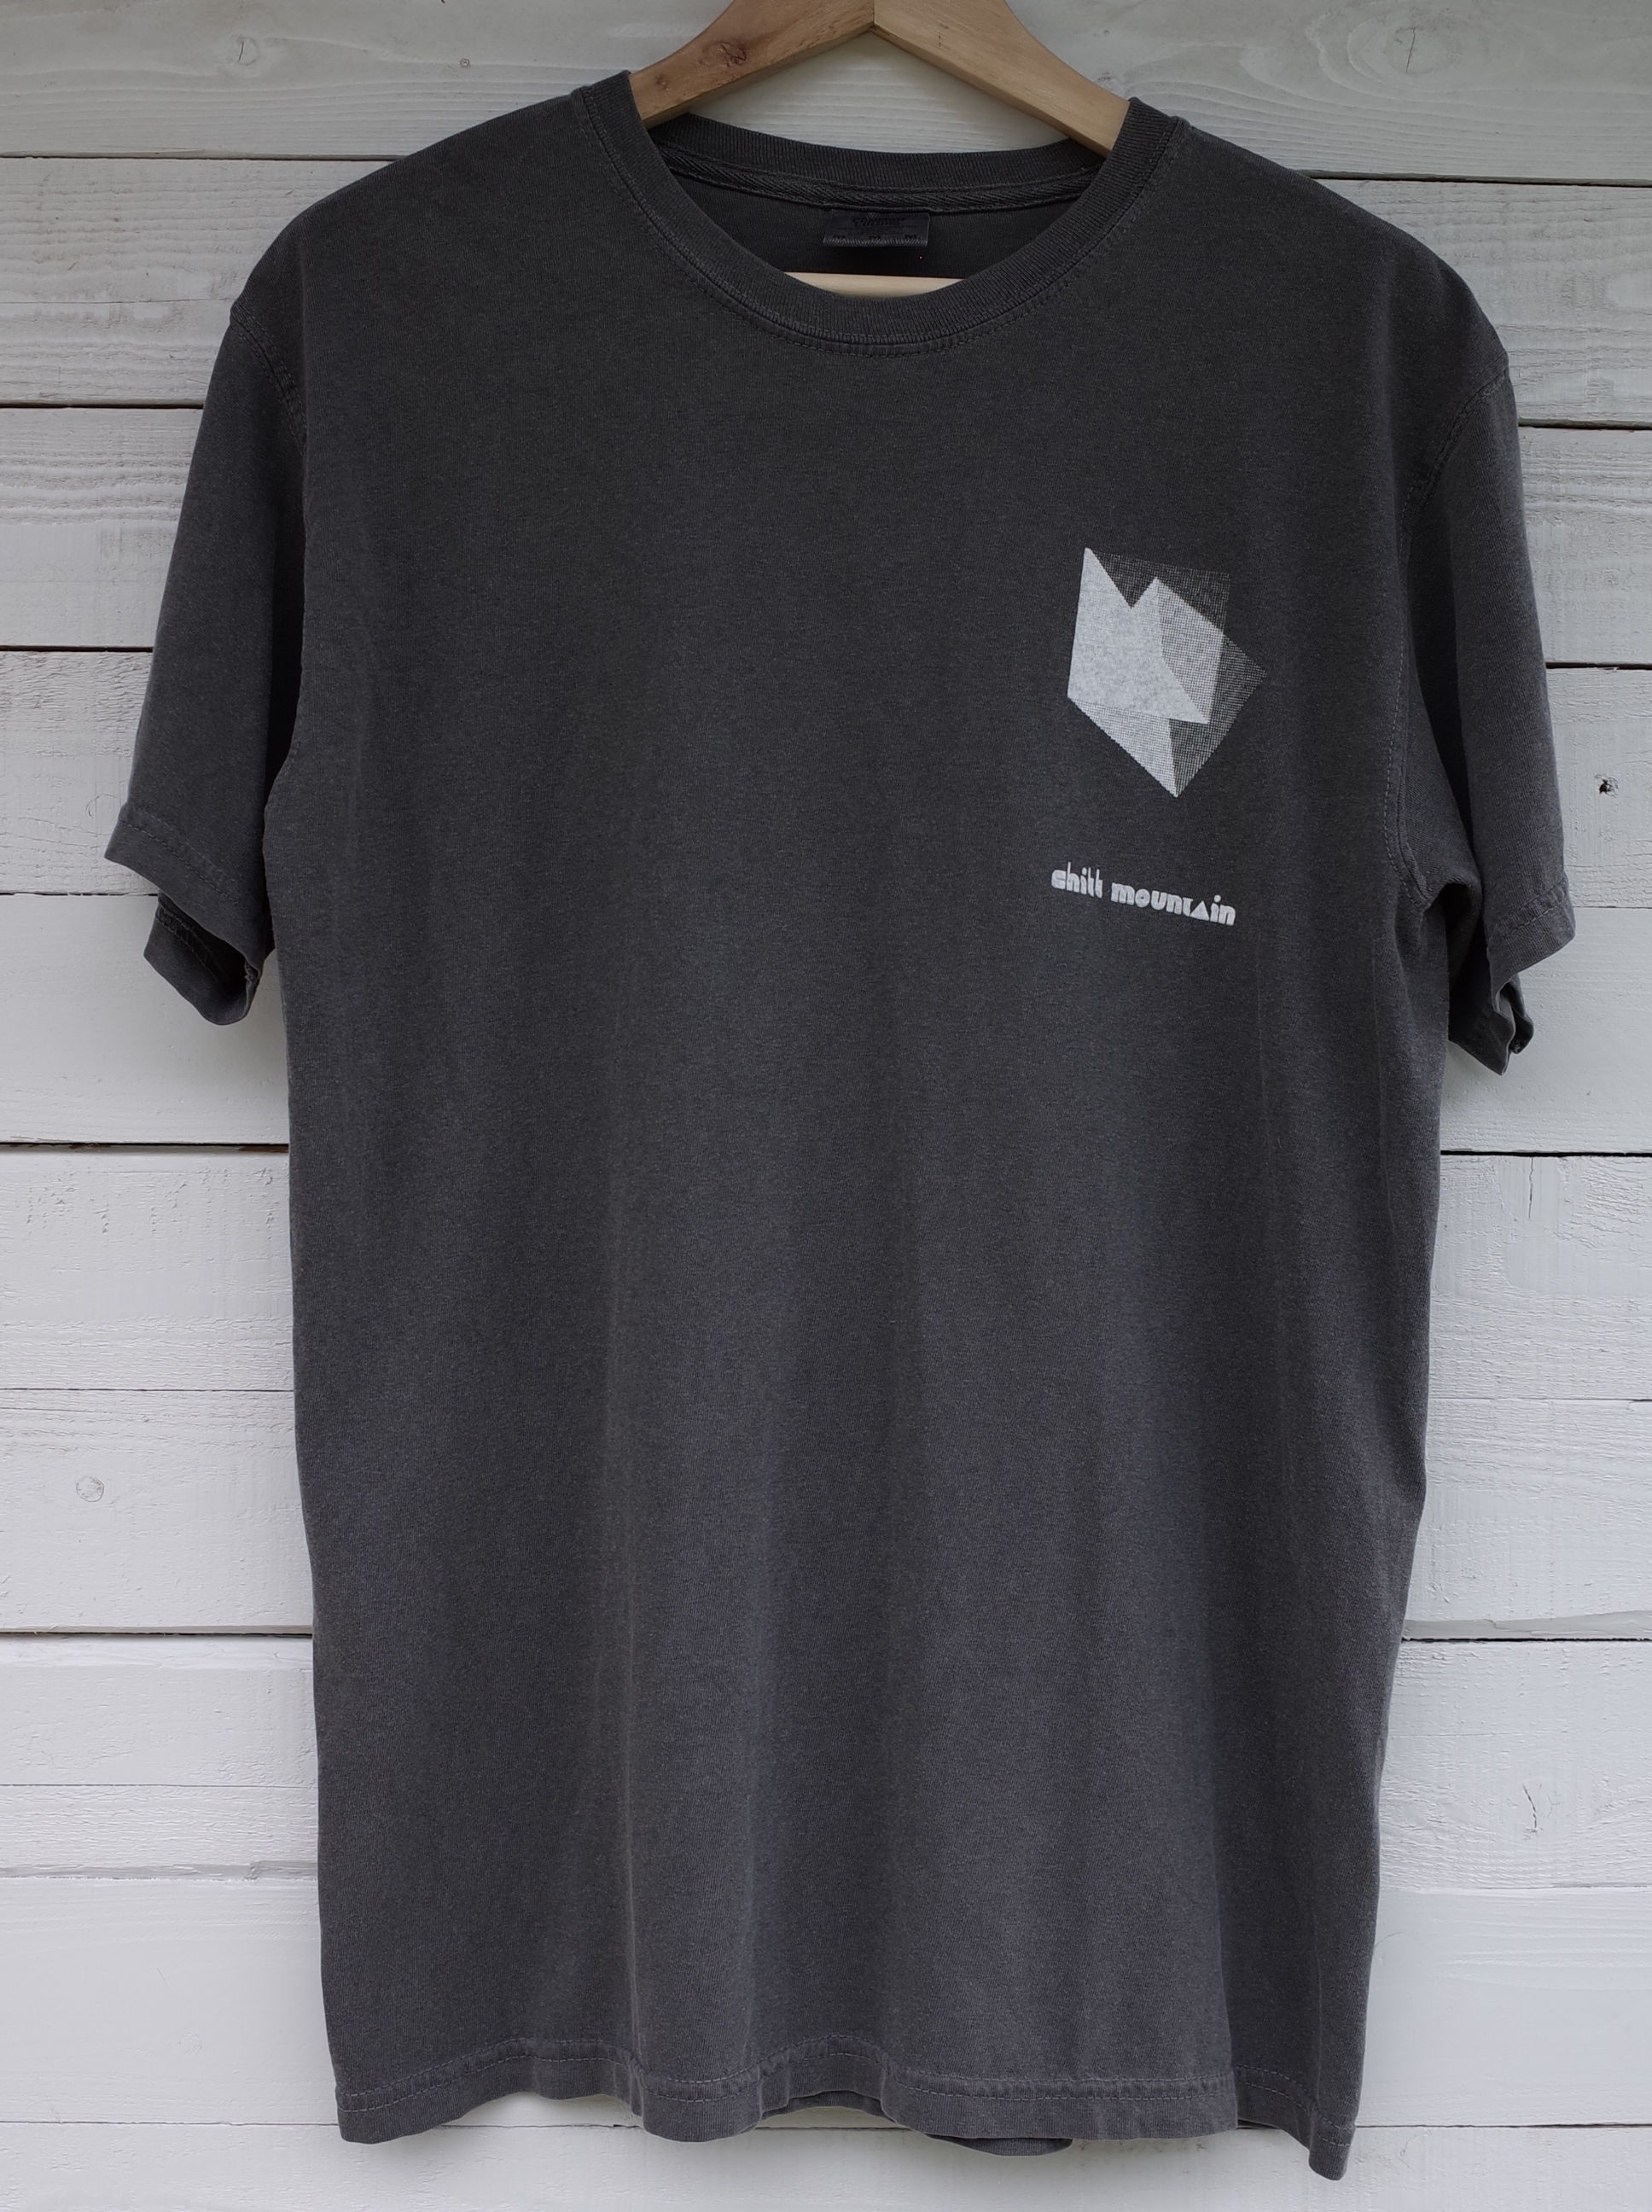 CHILL MOUNTAIN - chillmountain / Liquidanz T-shirts WashBlack Size M : WEAR gallery 0